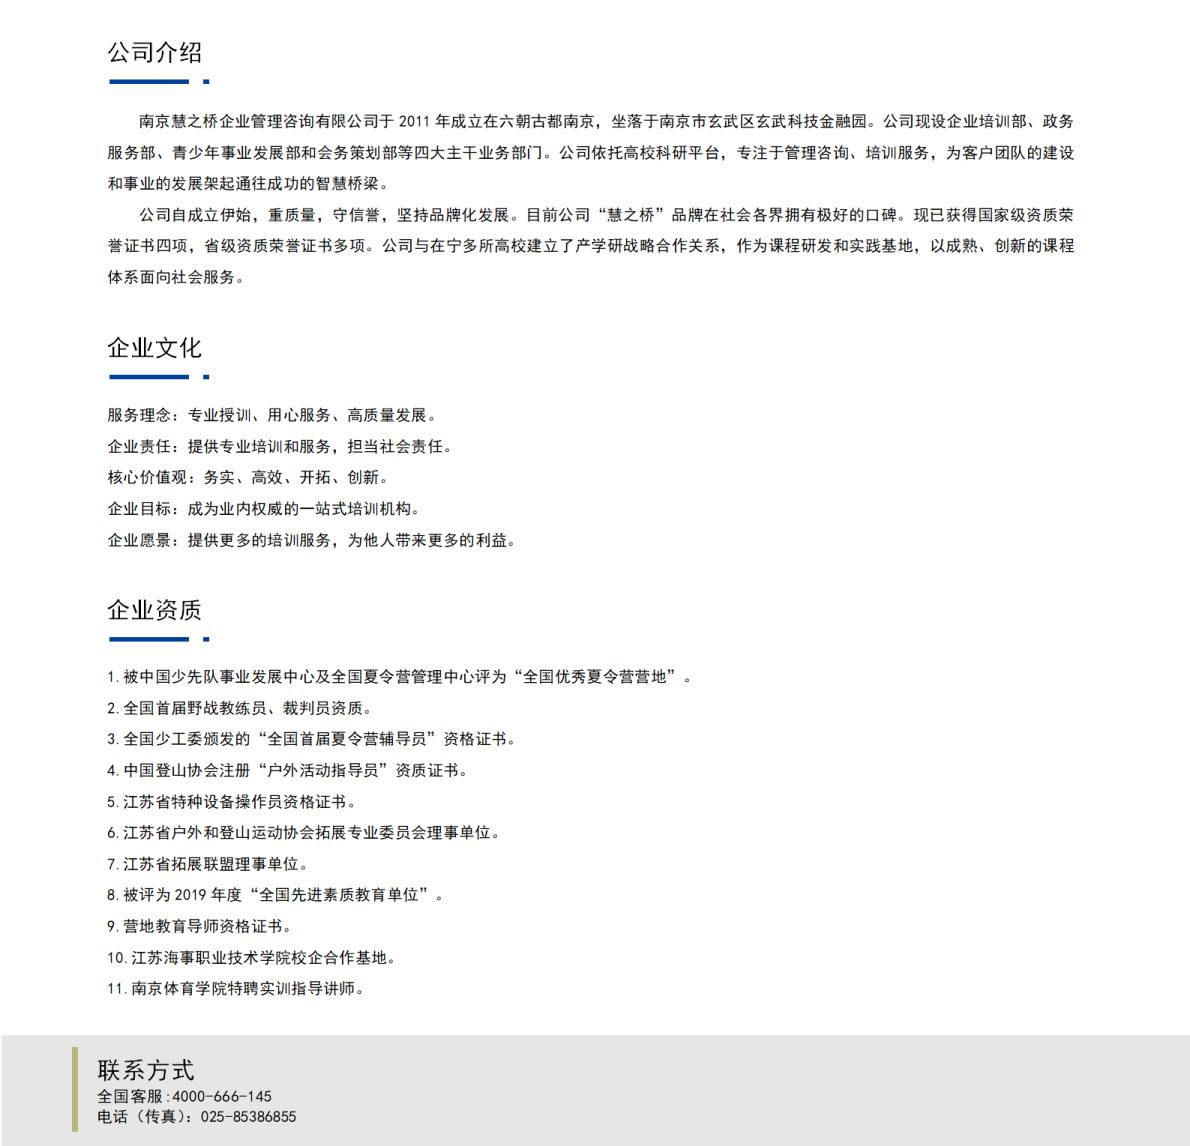 公司介绍_01.png